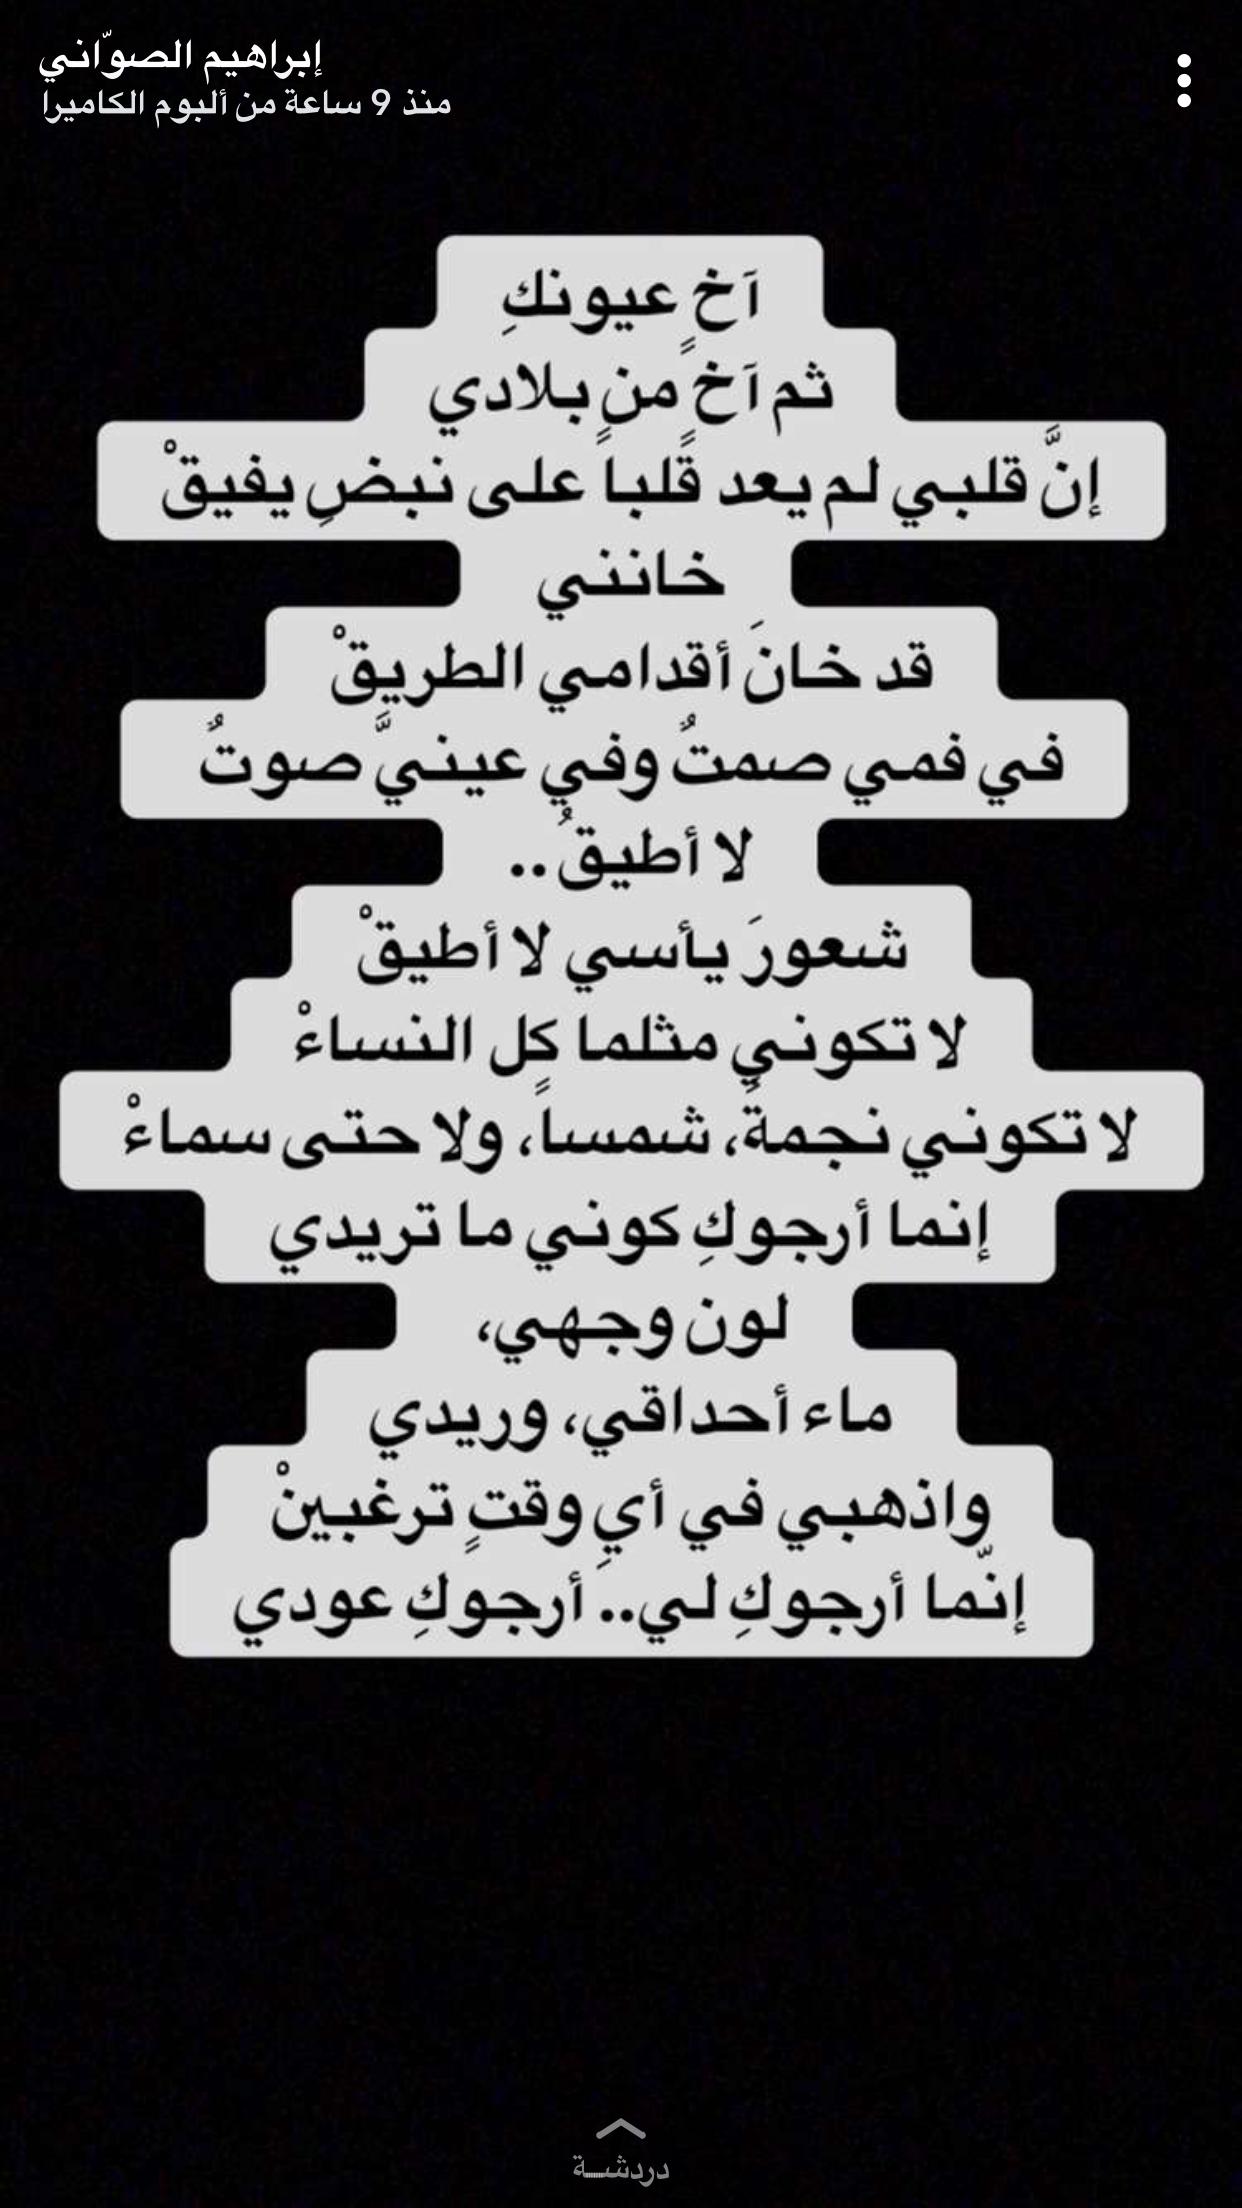 Pin By Yasmine On اشعار ابراهيم الصواني Cards Against Humanity Cards Biy